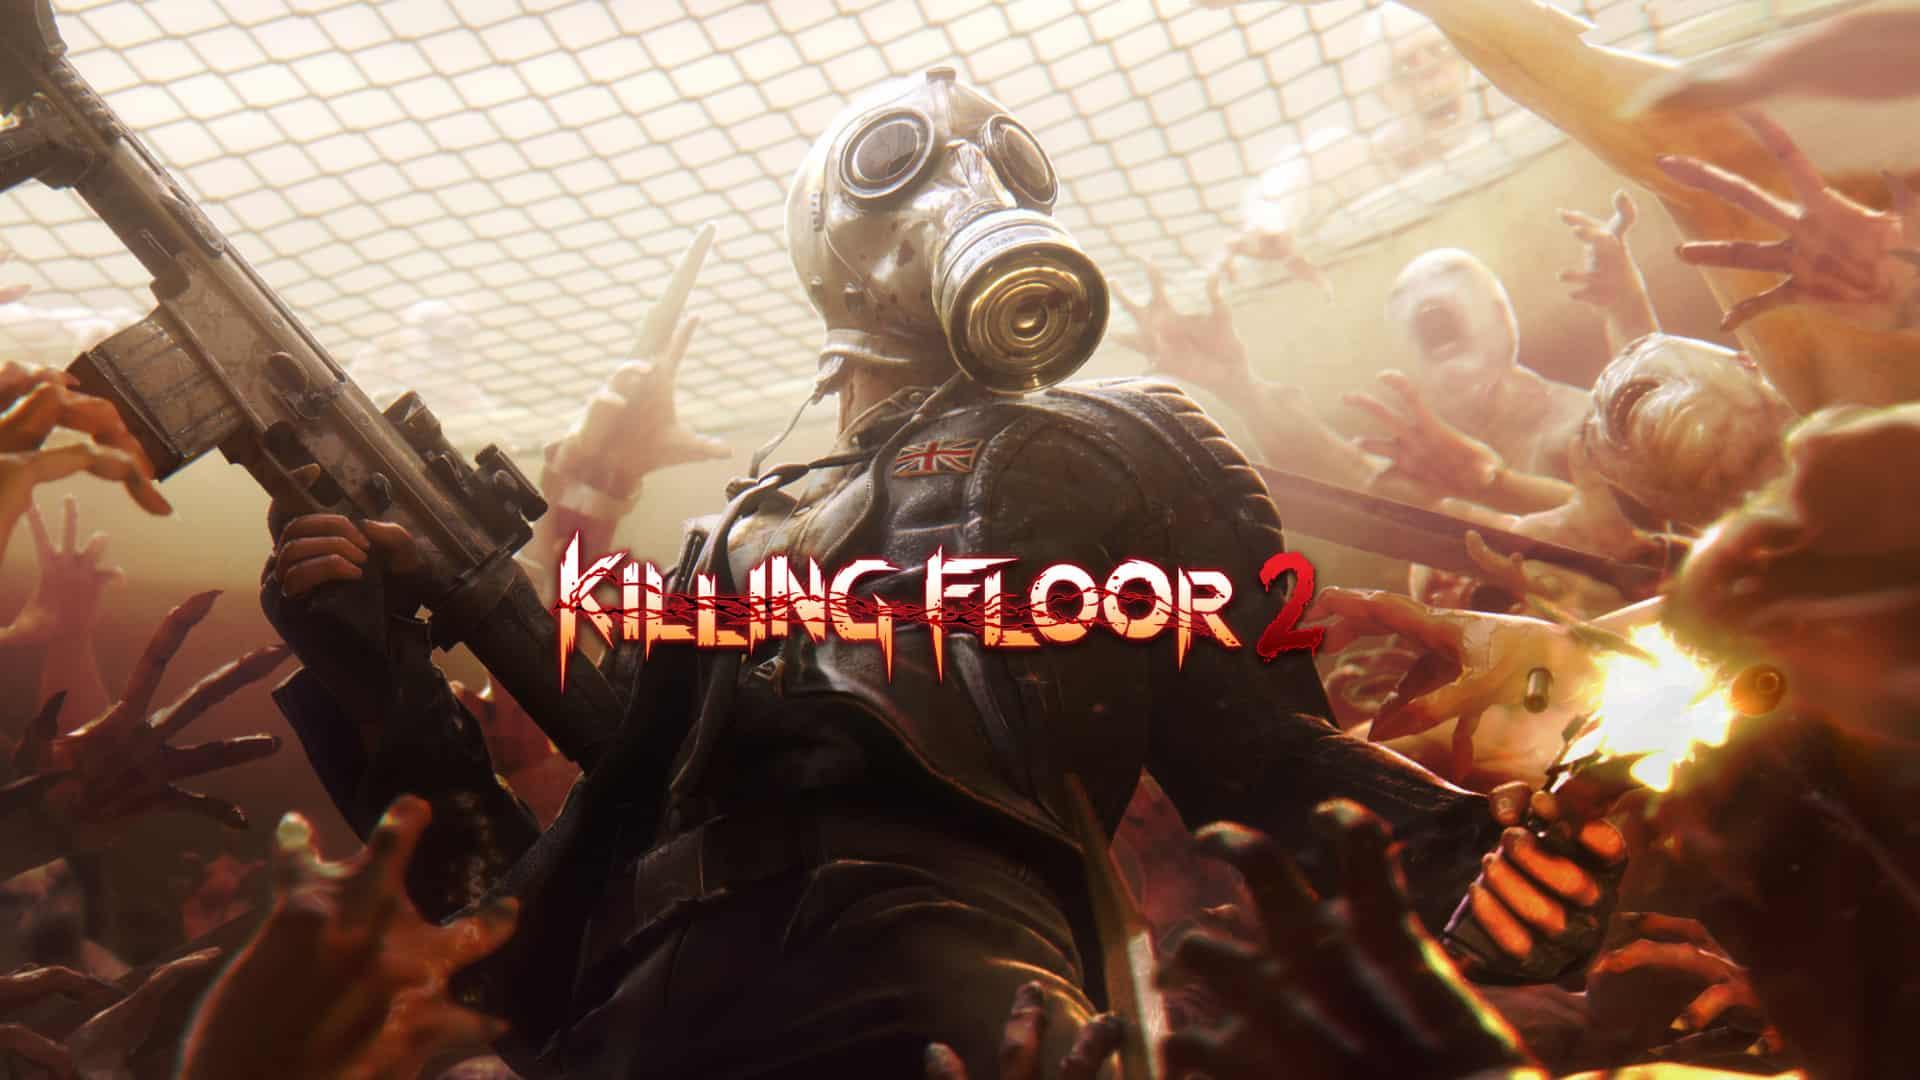 Killing Floor 2 immagine in evidenza